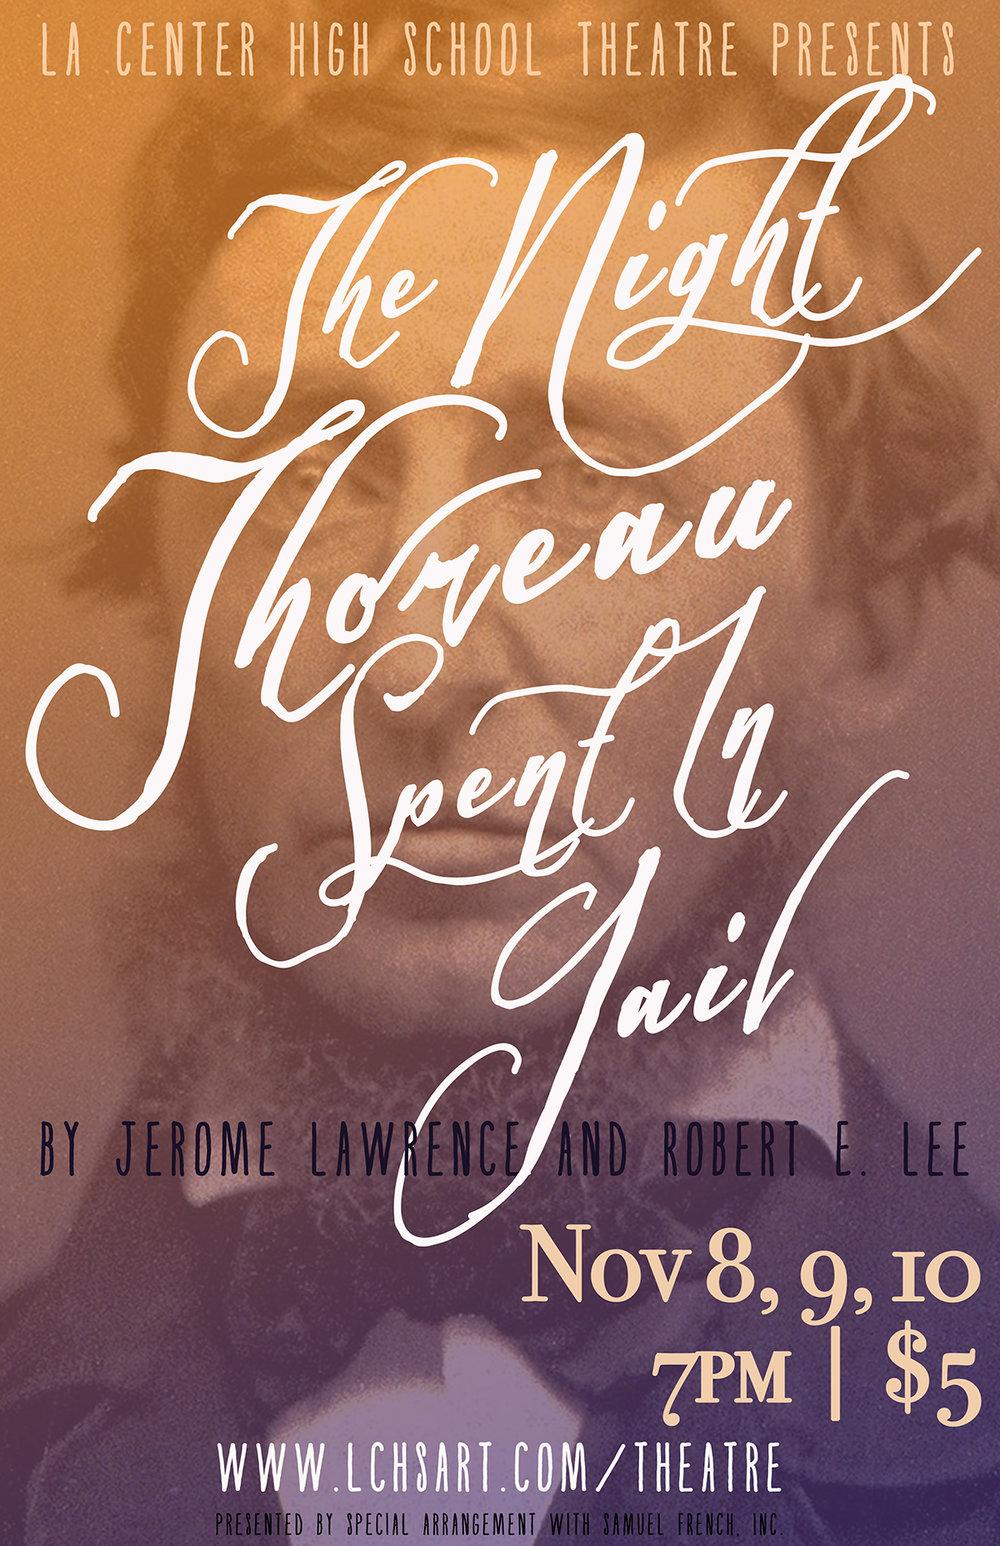 Thoreau Poster Small.jpg